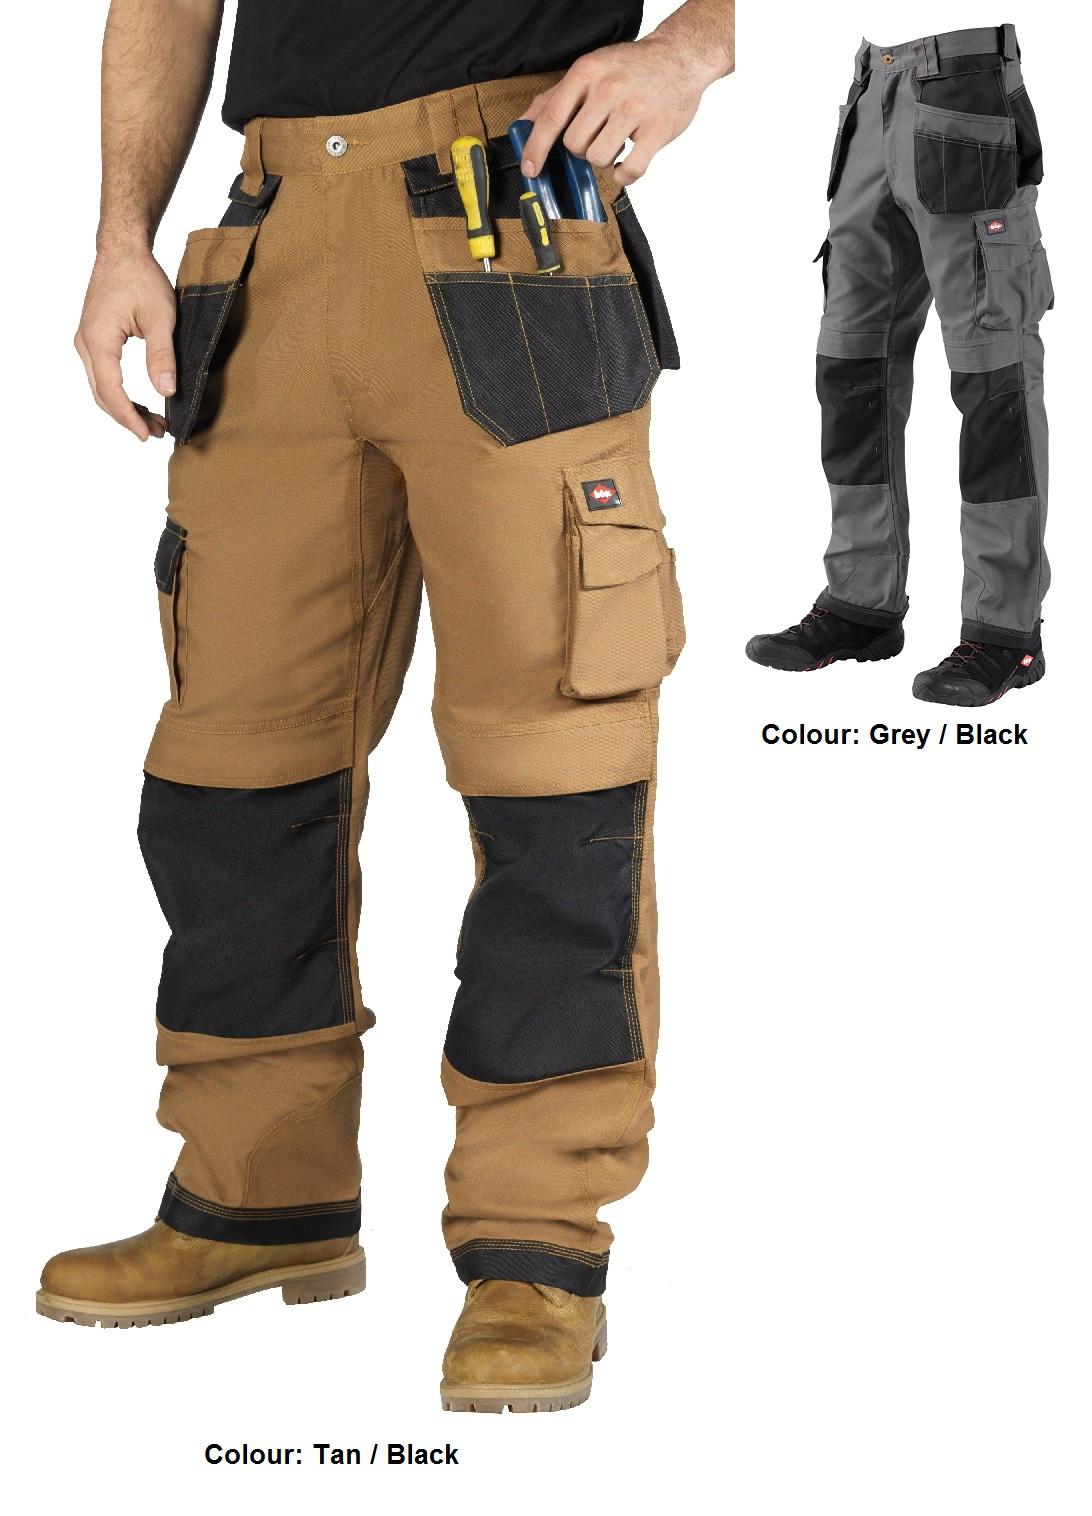 ff8b64fd Lee Cooper Workwear Premium Heavyweight Trousers-G.S.Mahal ...